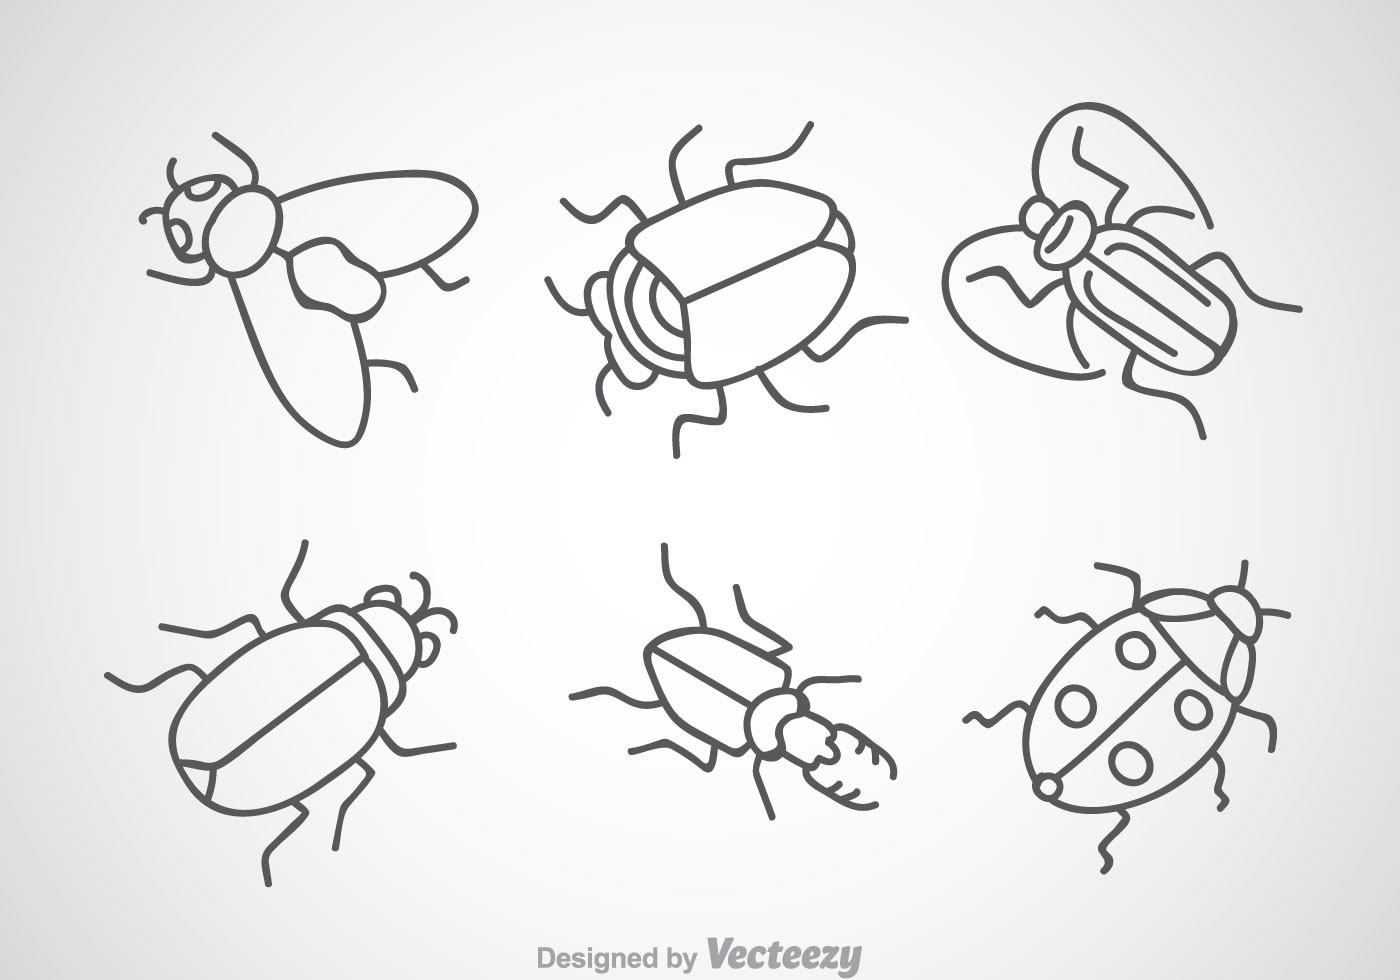 Répulsifs contre les insectes